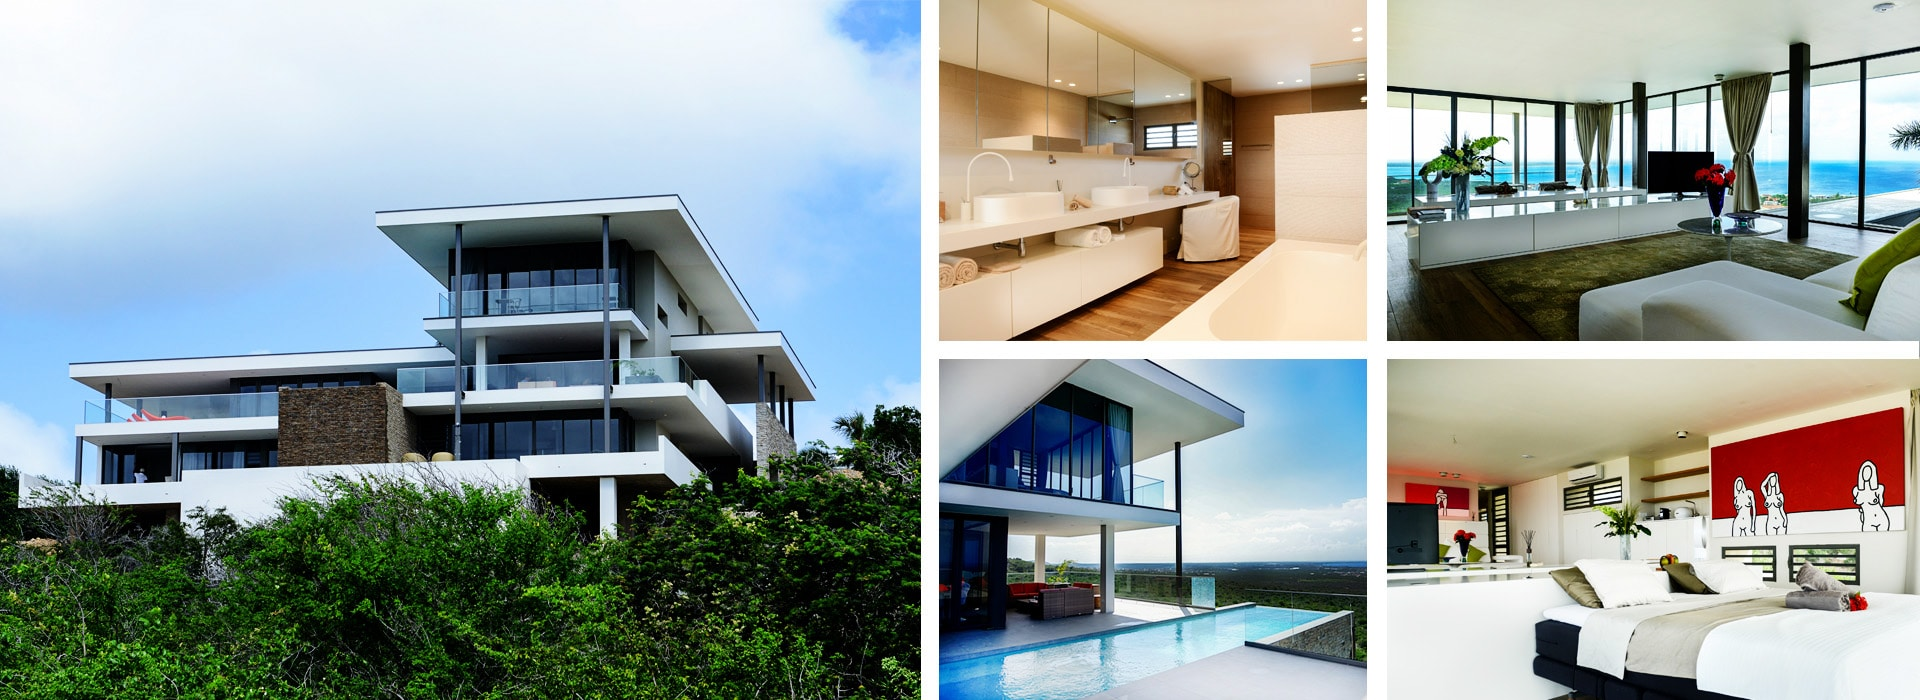 JK House Bonaire rental